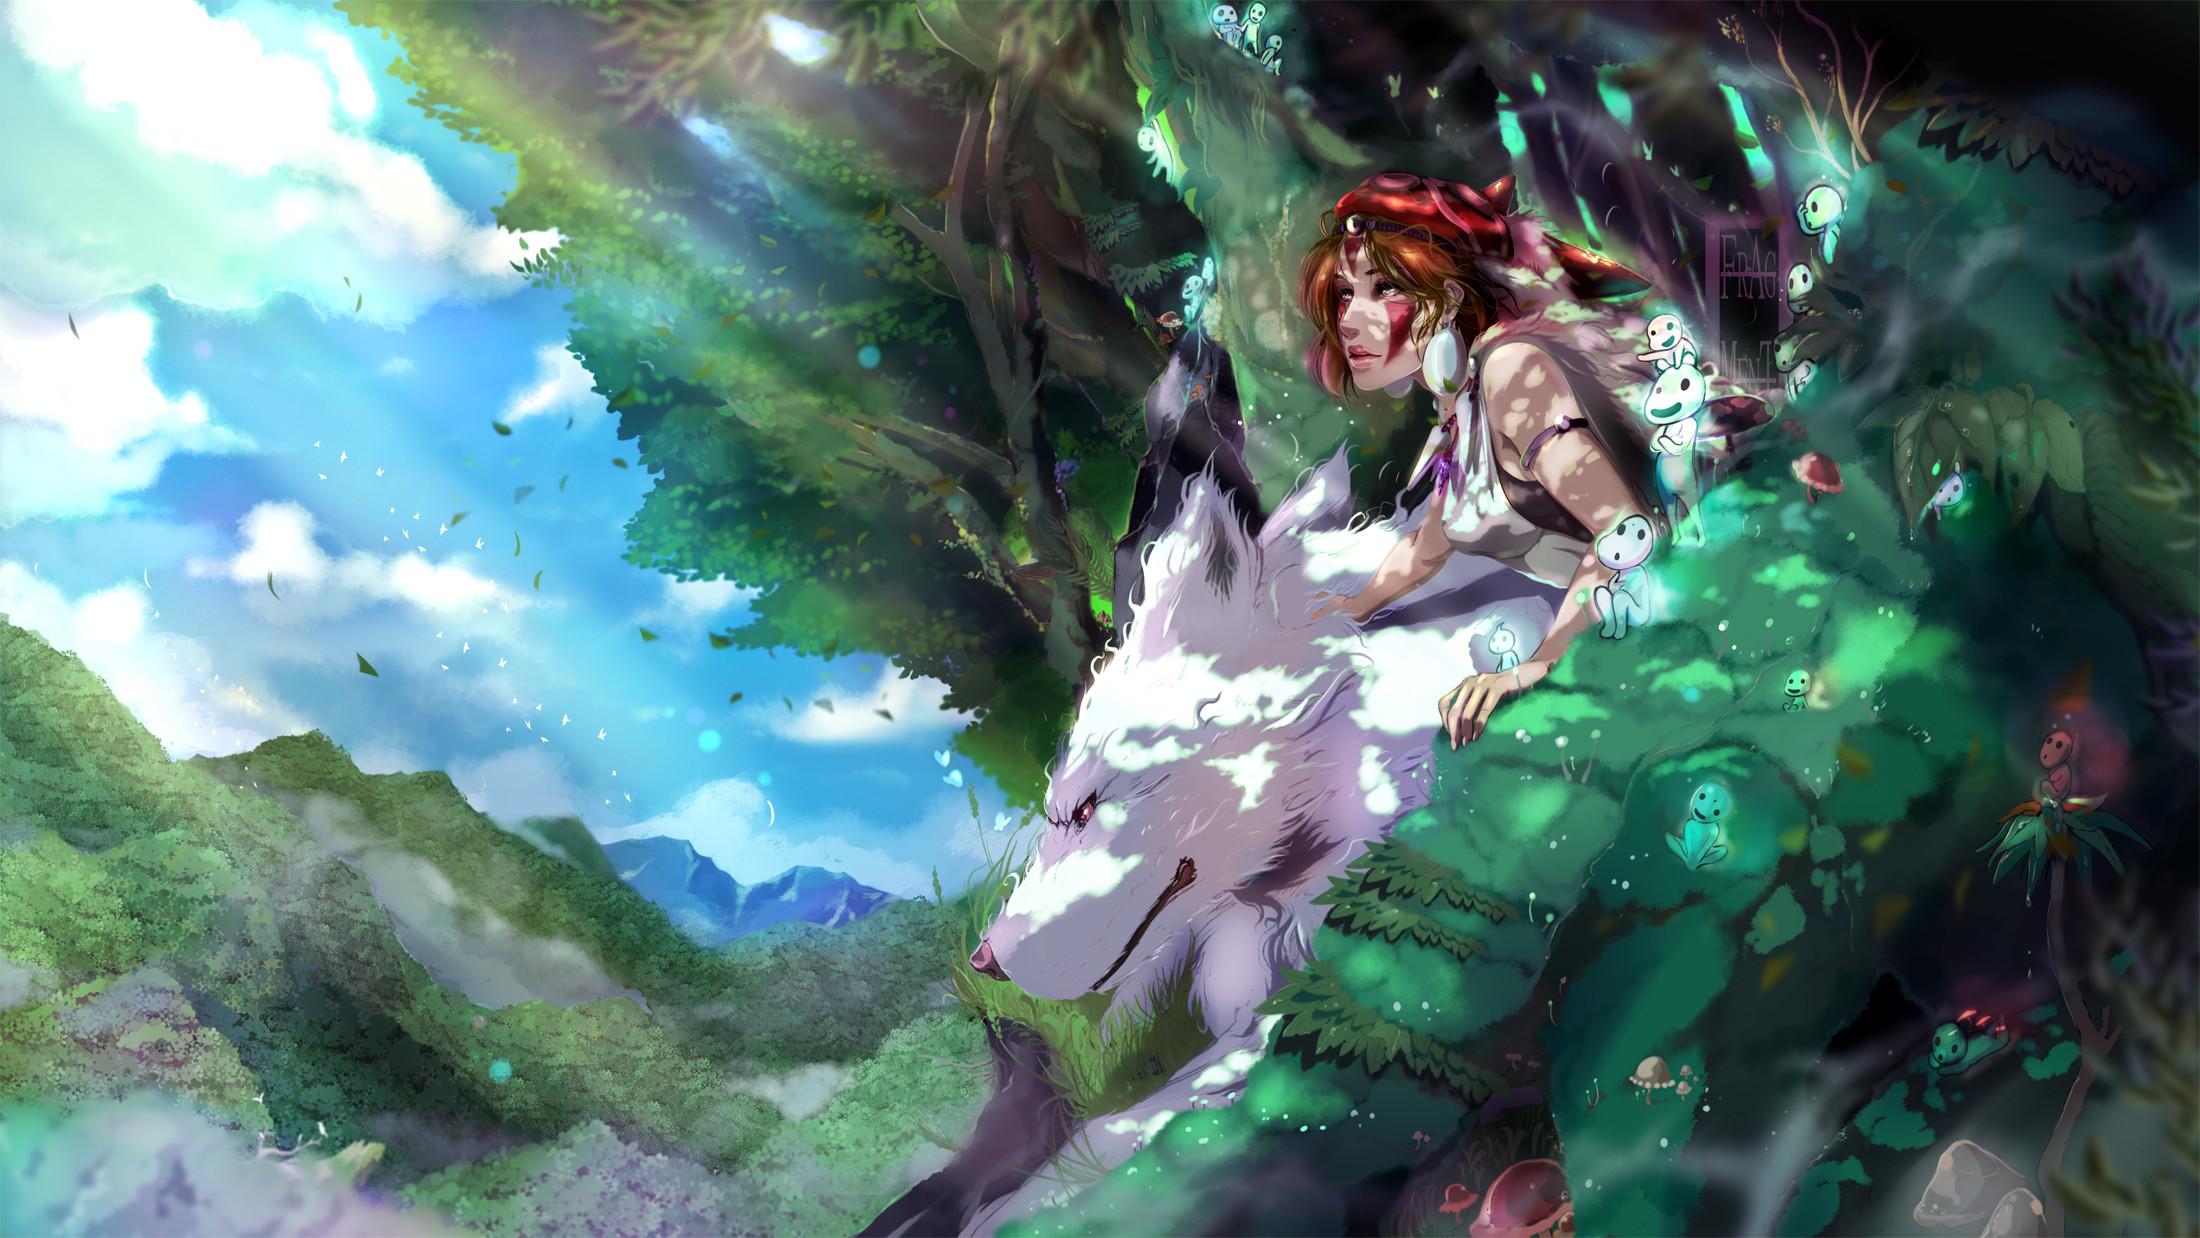 Mononoke Hime · download Mononoke Hime image